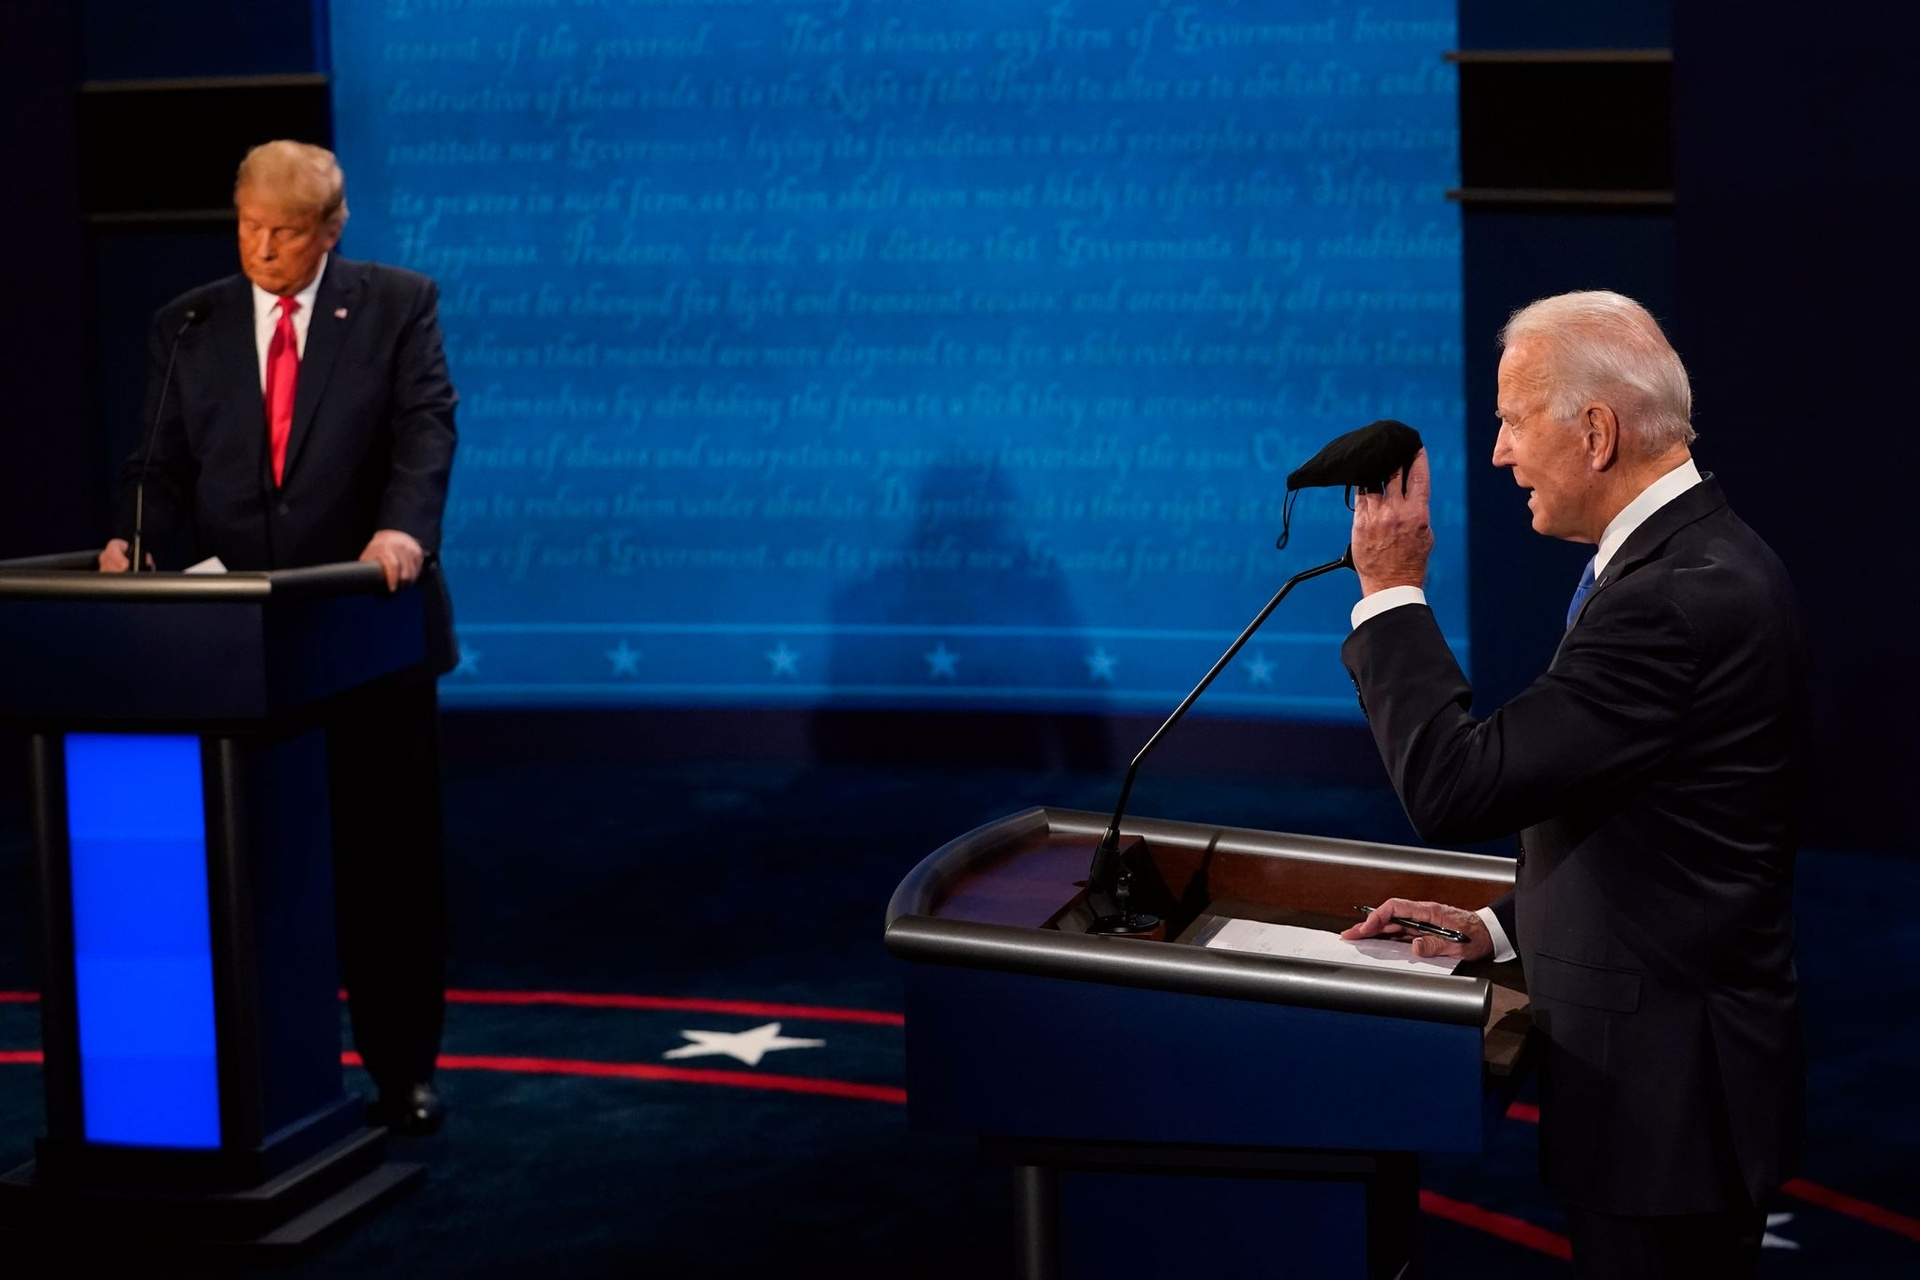 ong Biden tim cach thoat khoi Trump anh 3